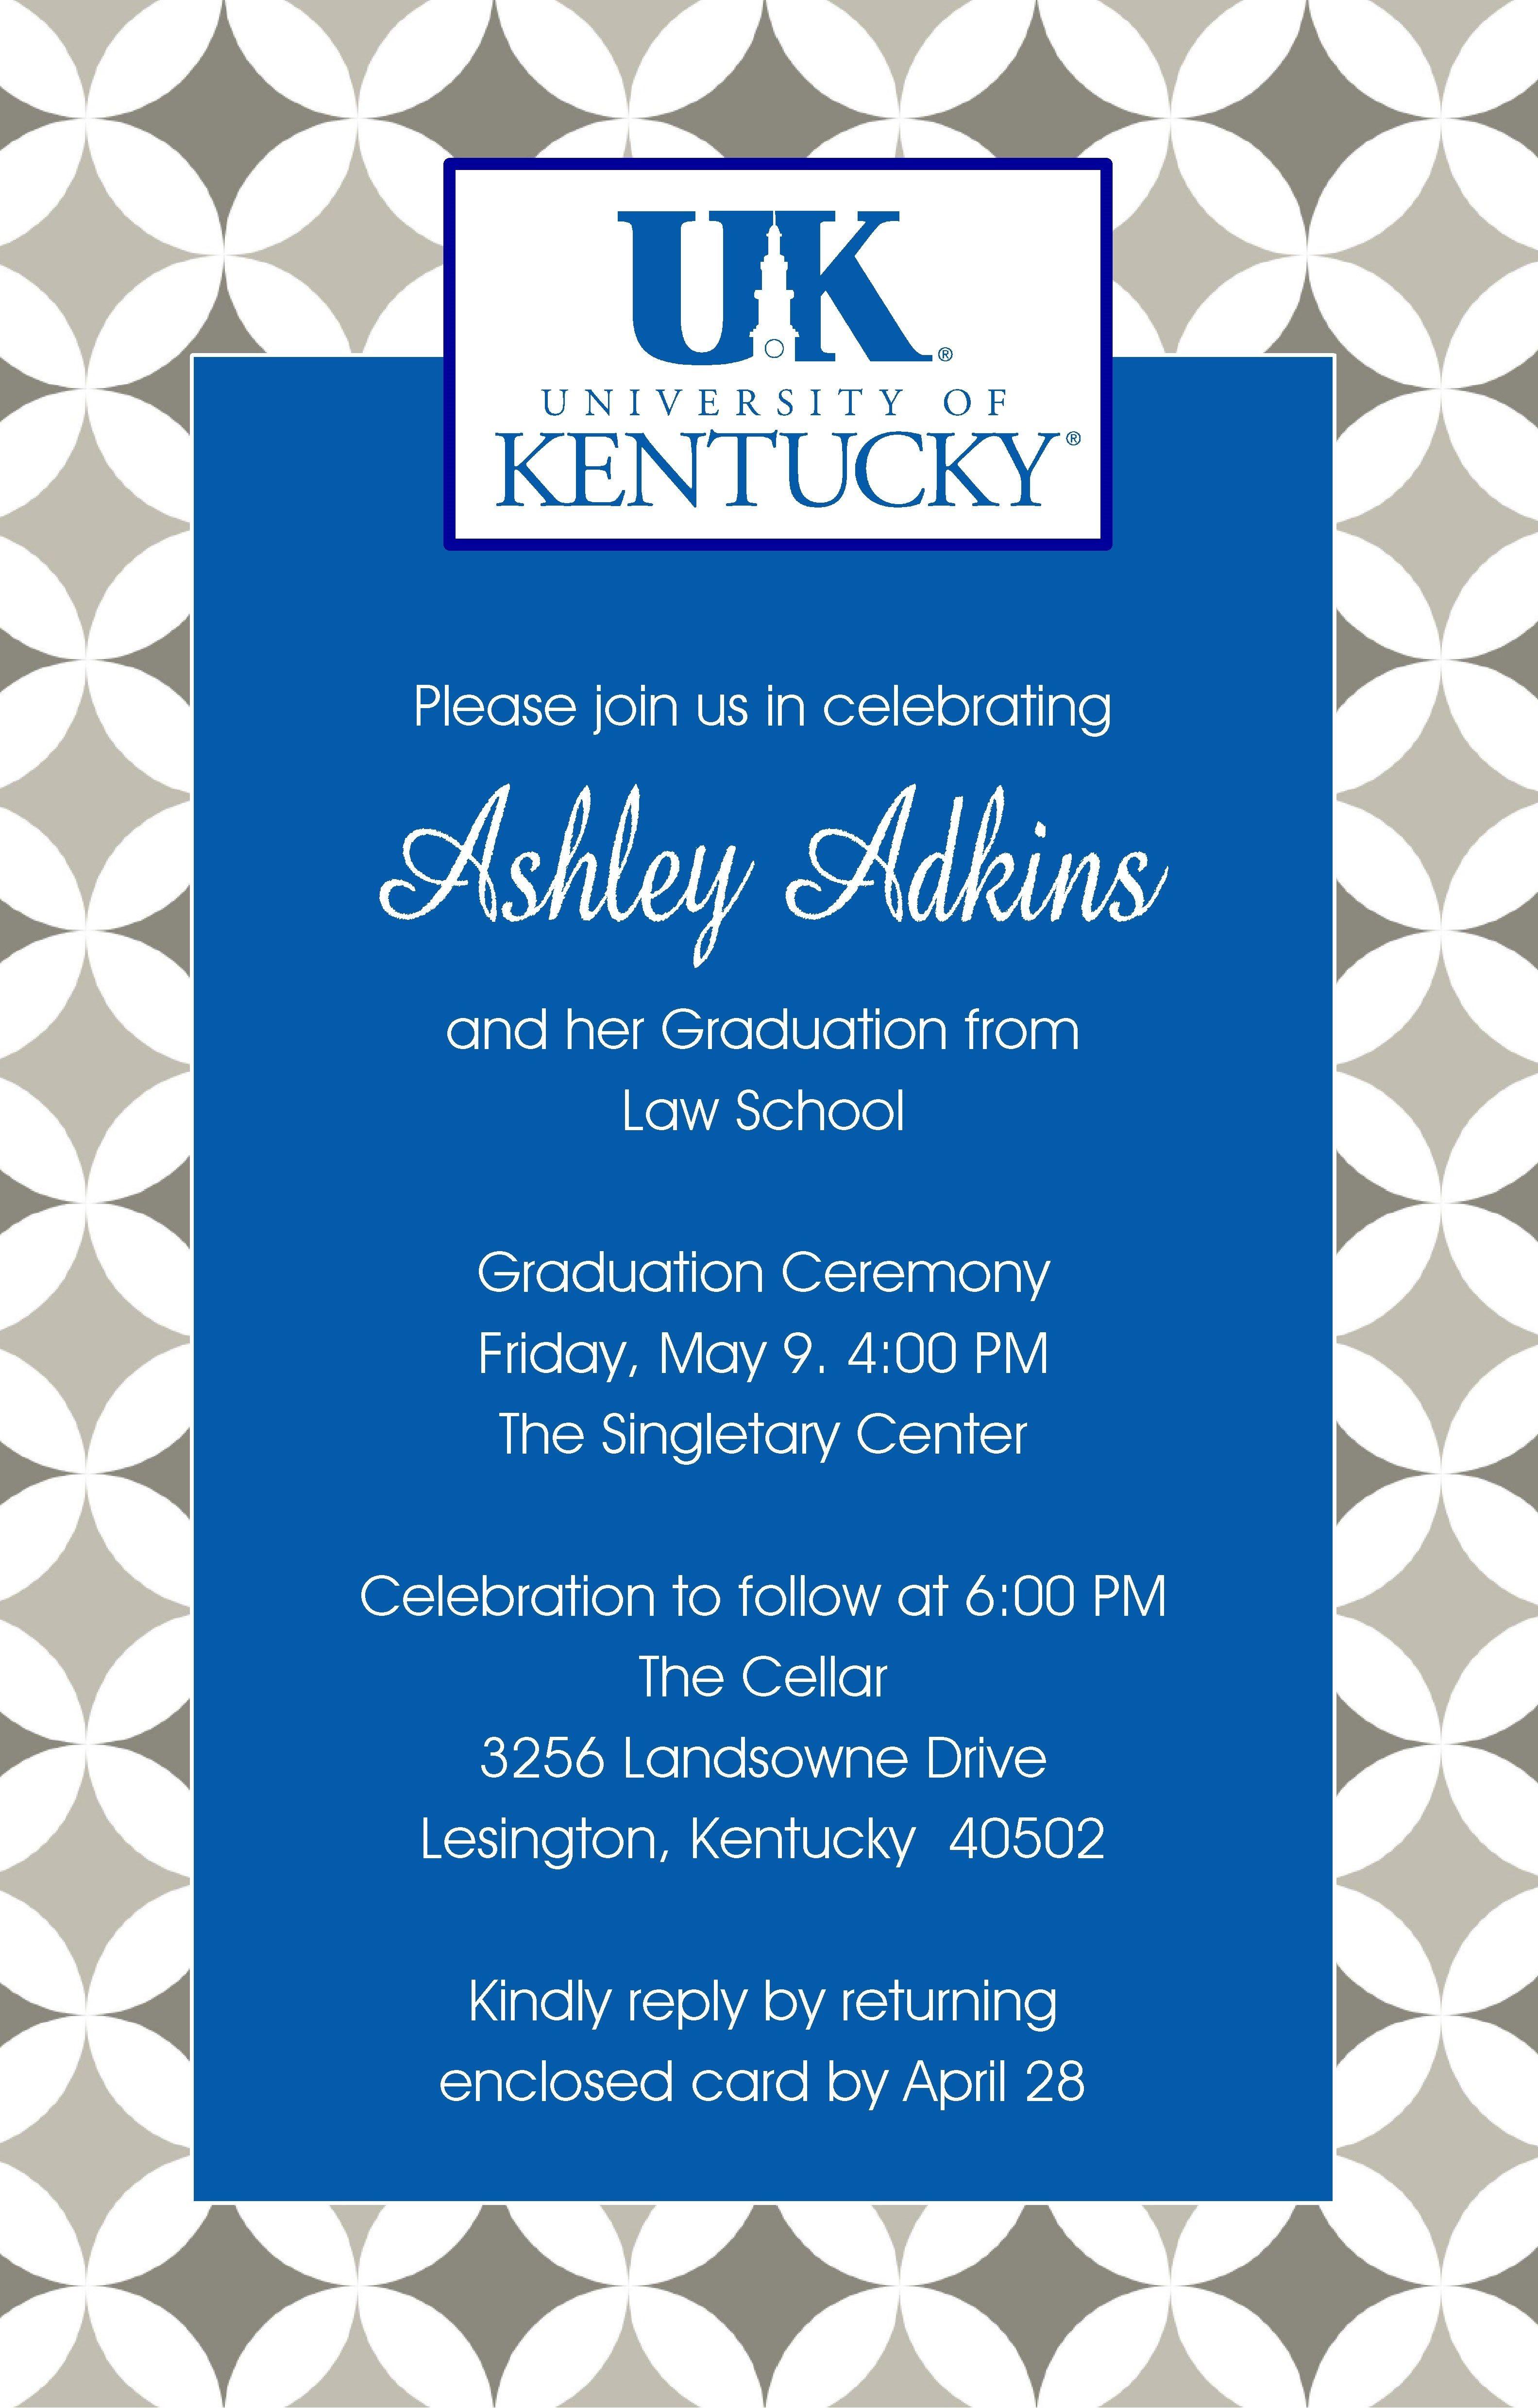 University of Kentucky Graduation Invitation | College | Pinterest